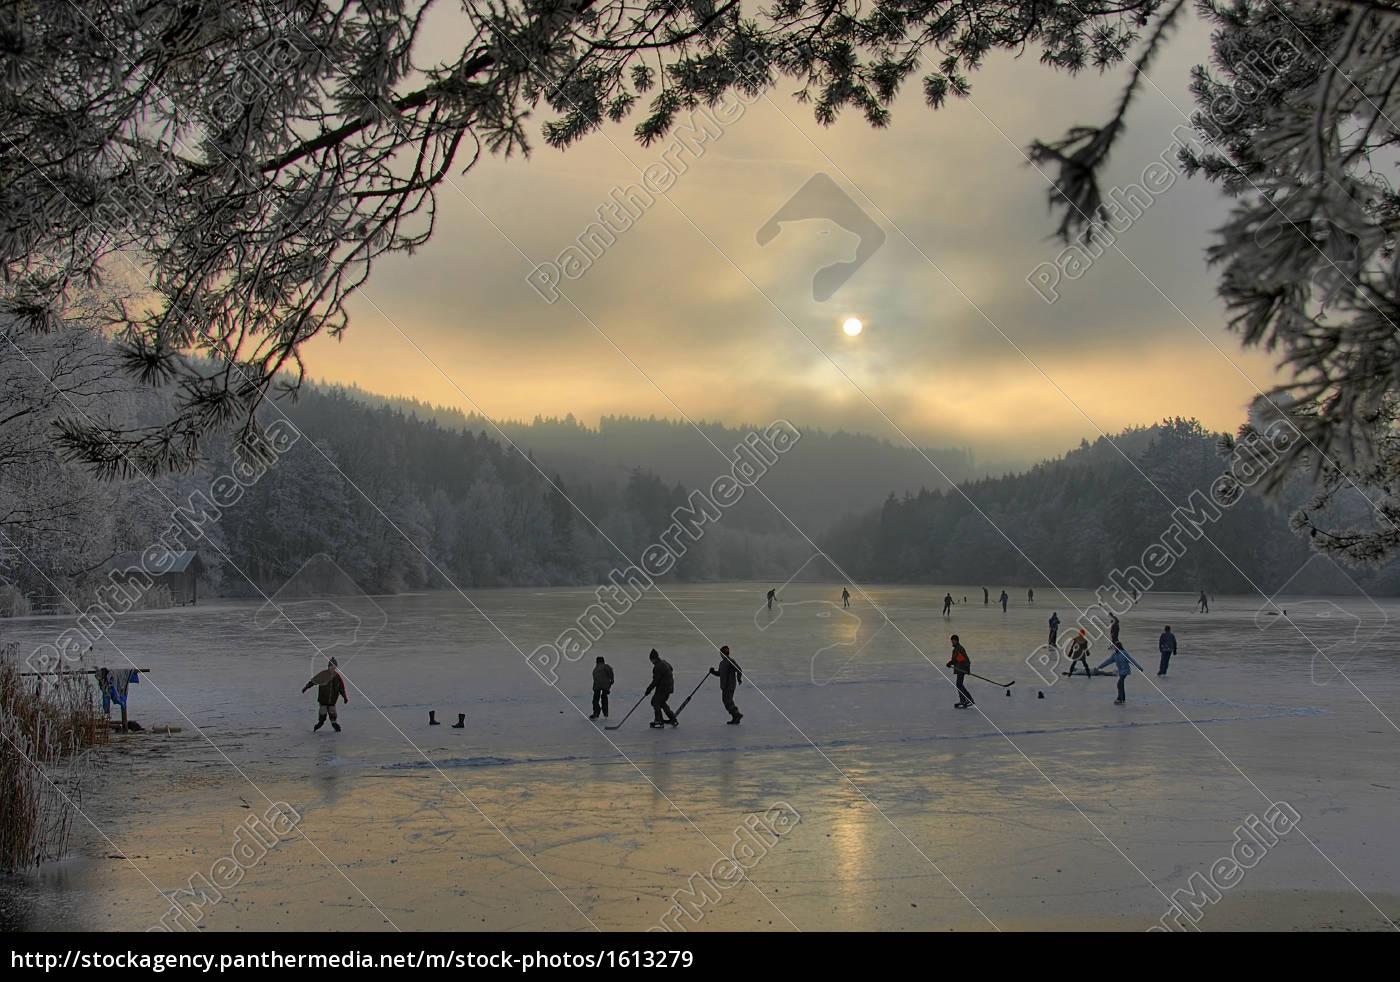 ice, skating, on, the, lake - 1613279